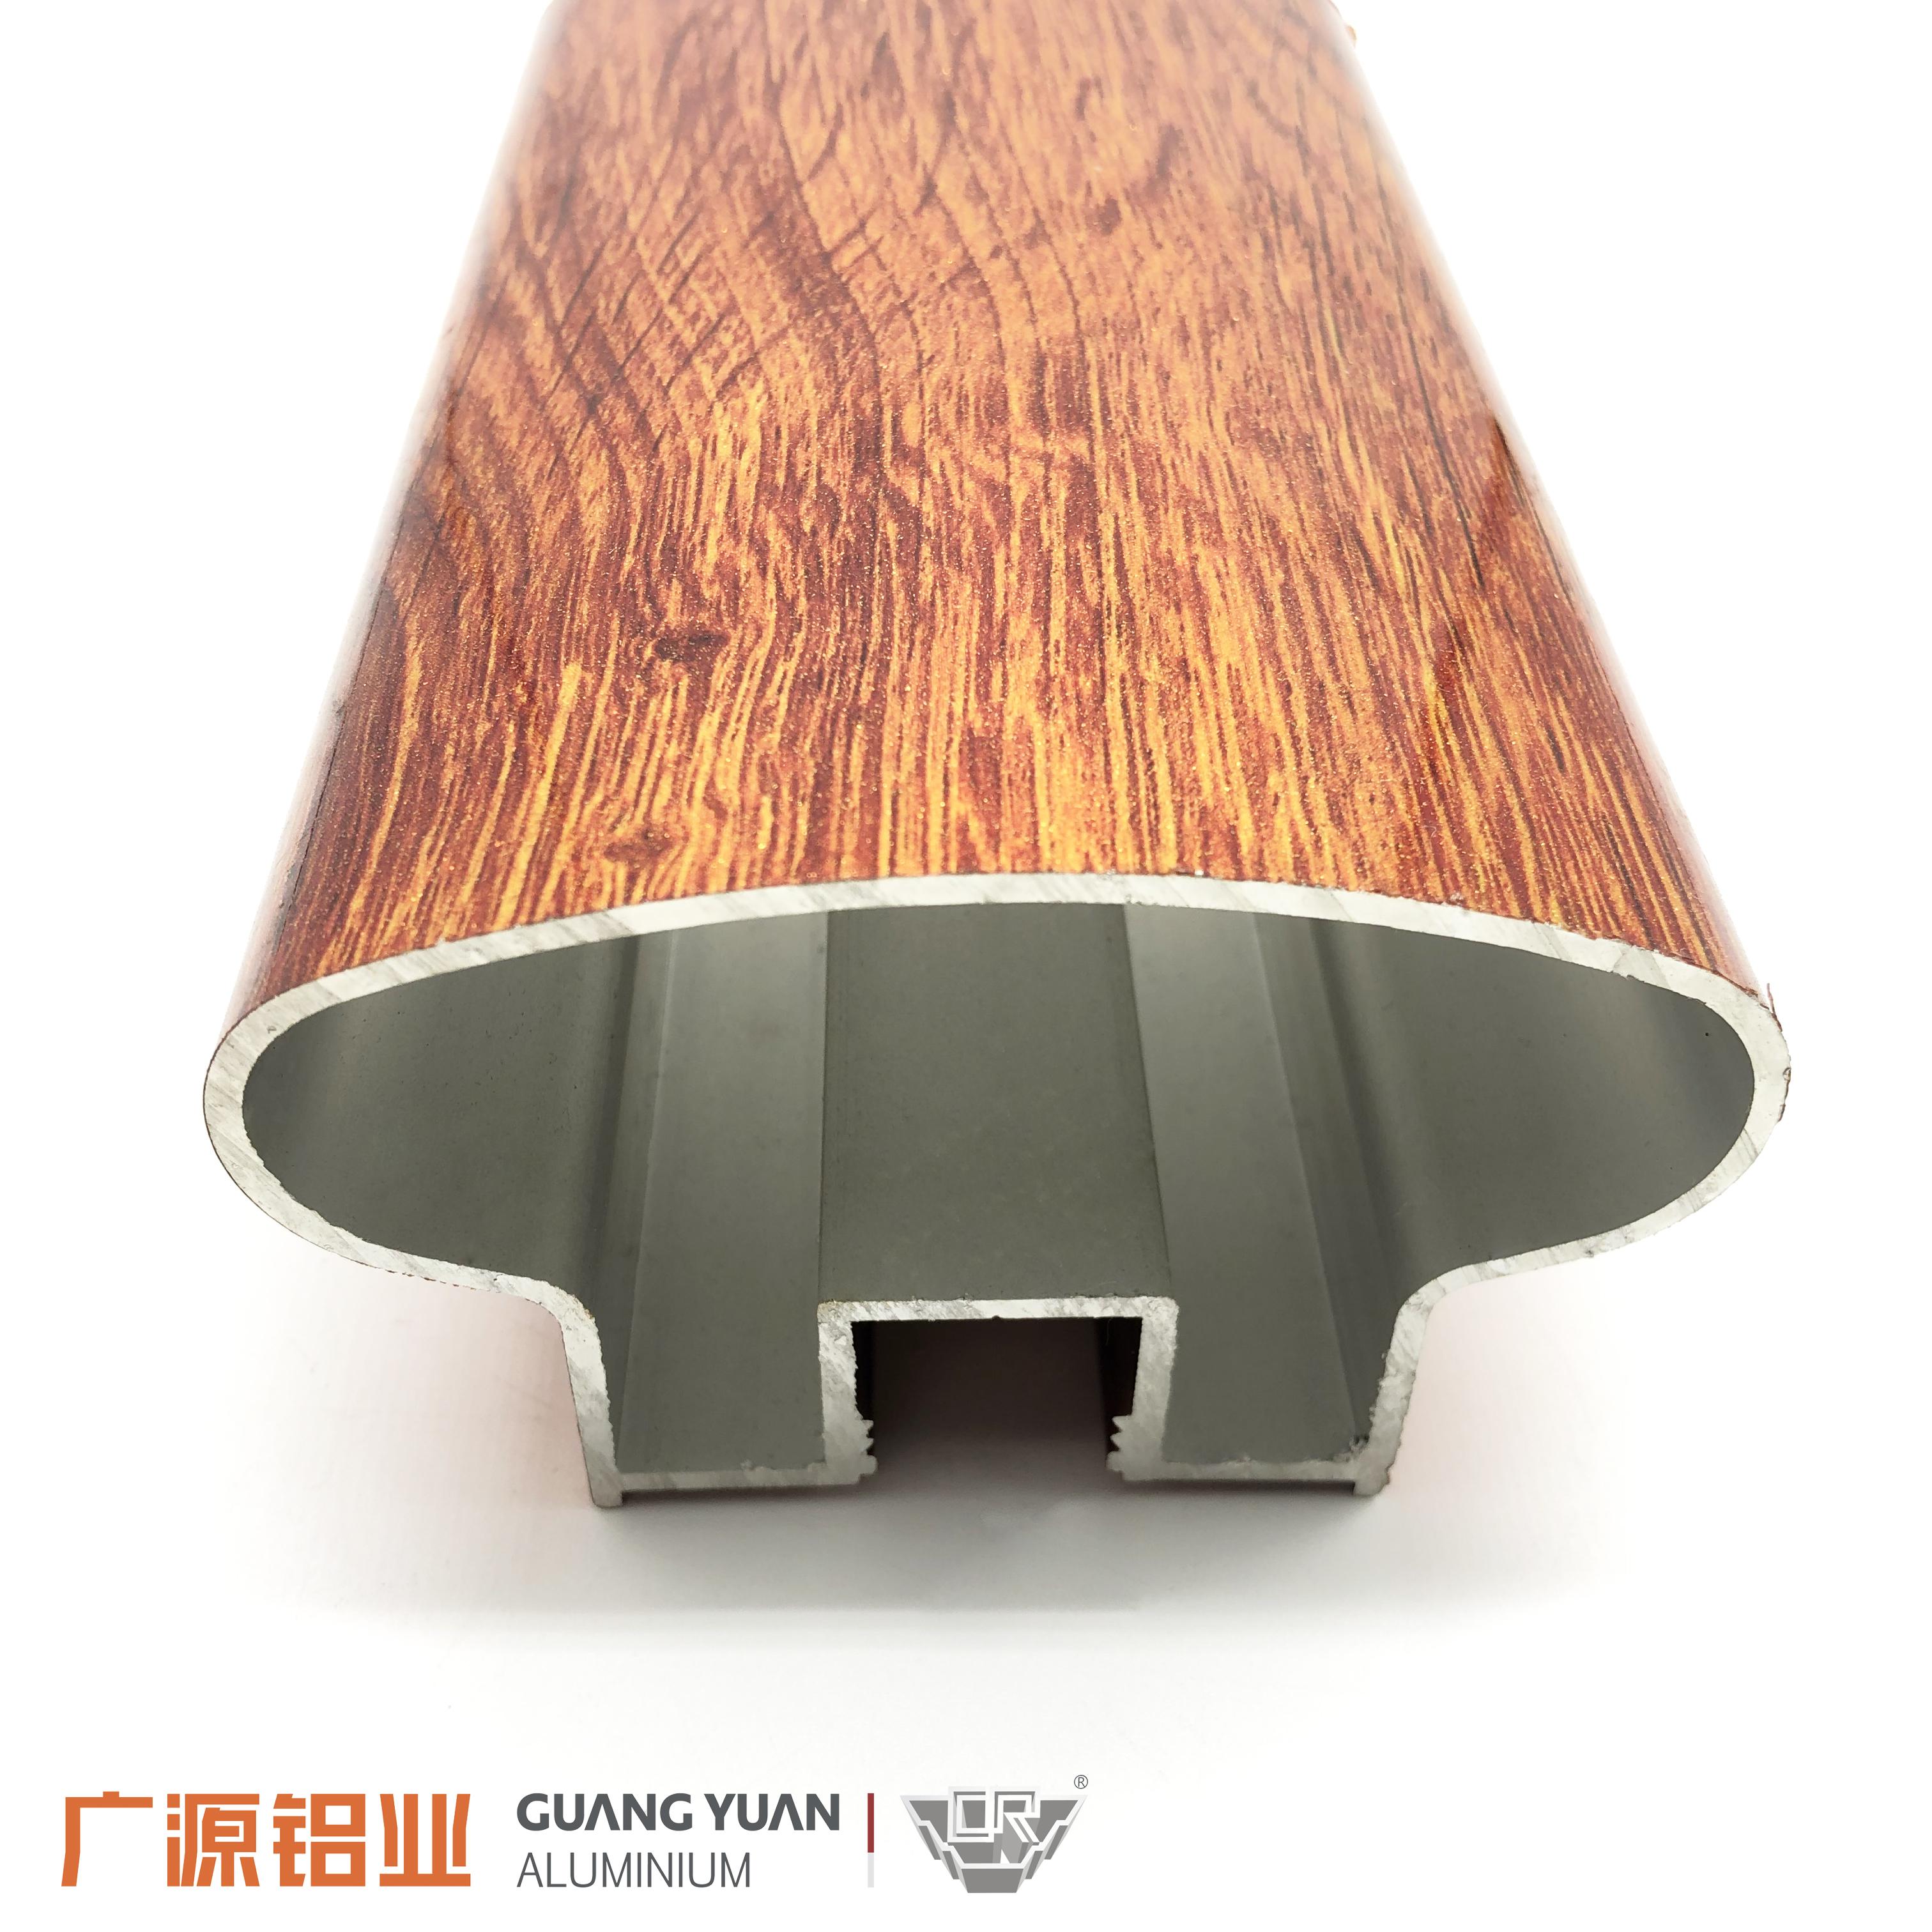 Aluminium Handrail Profiles